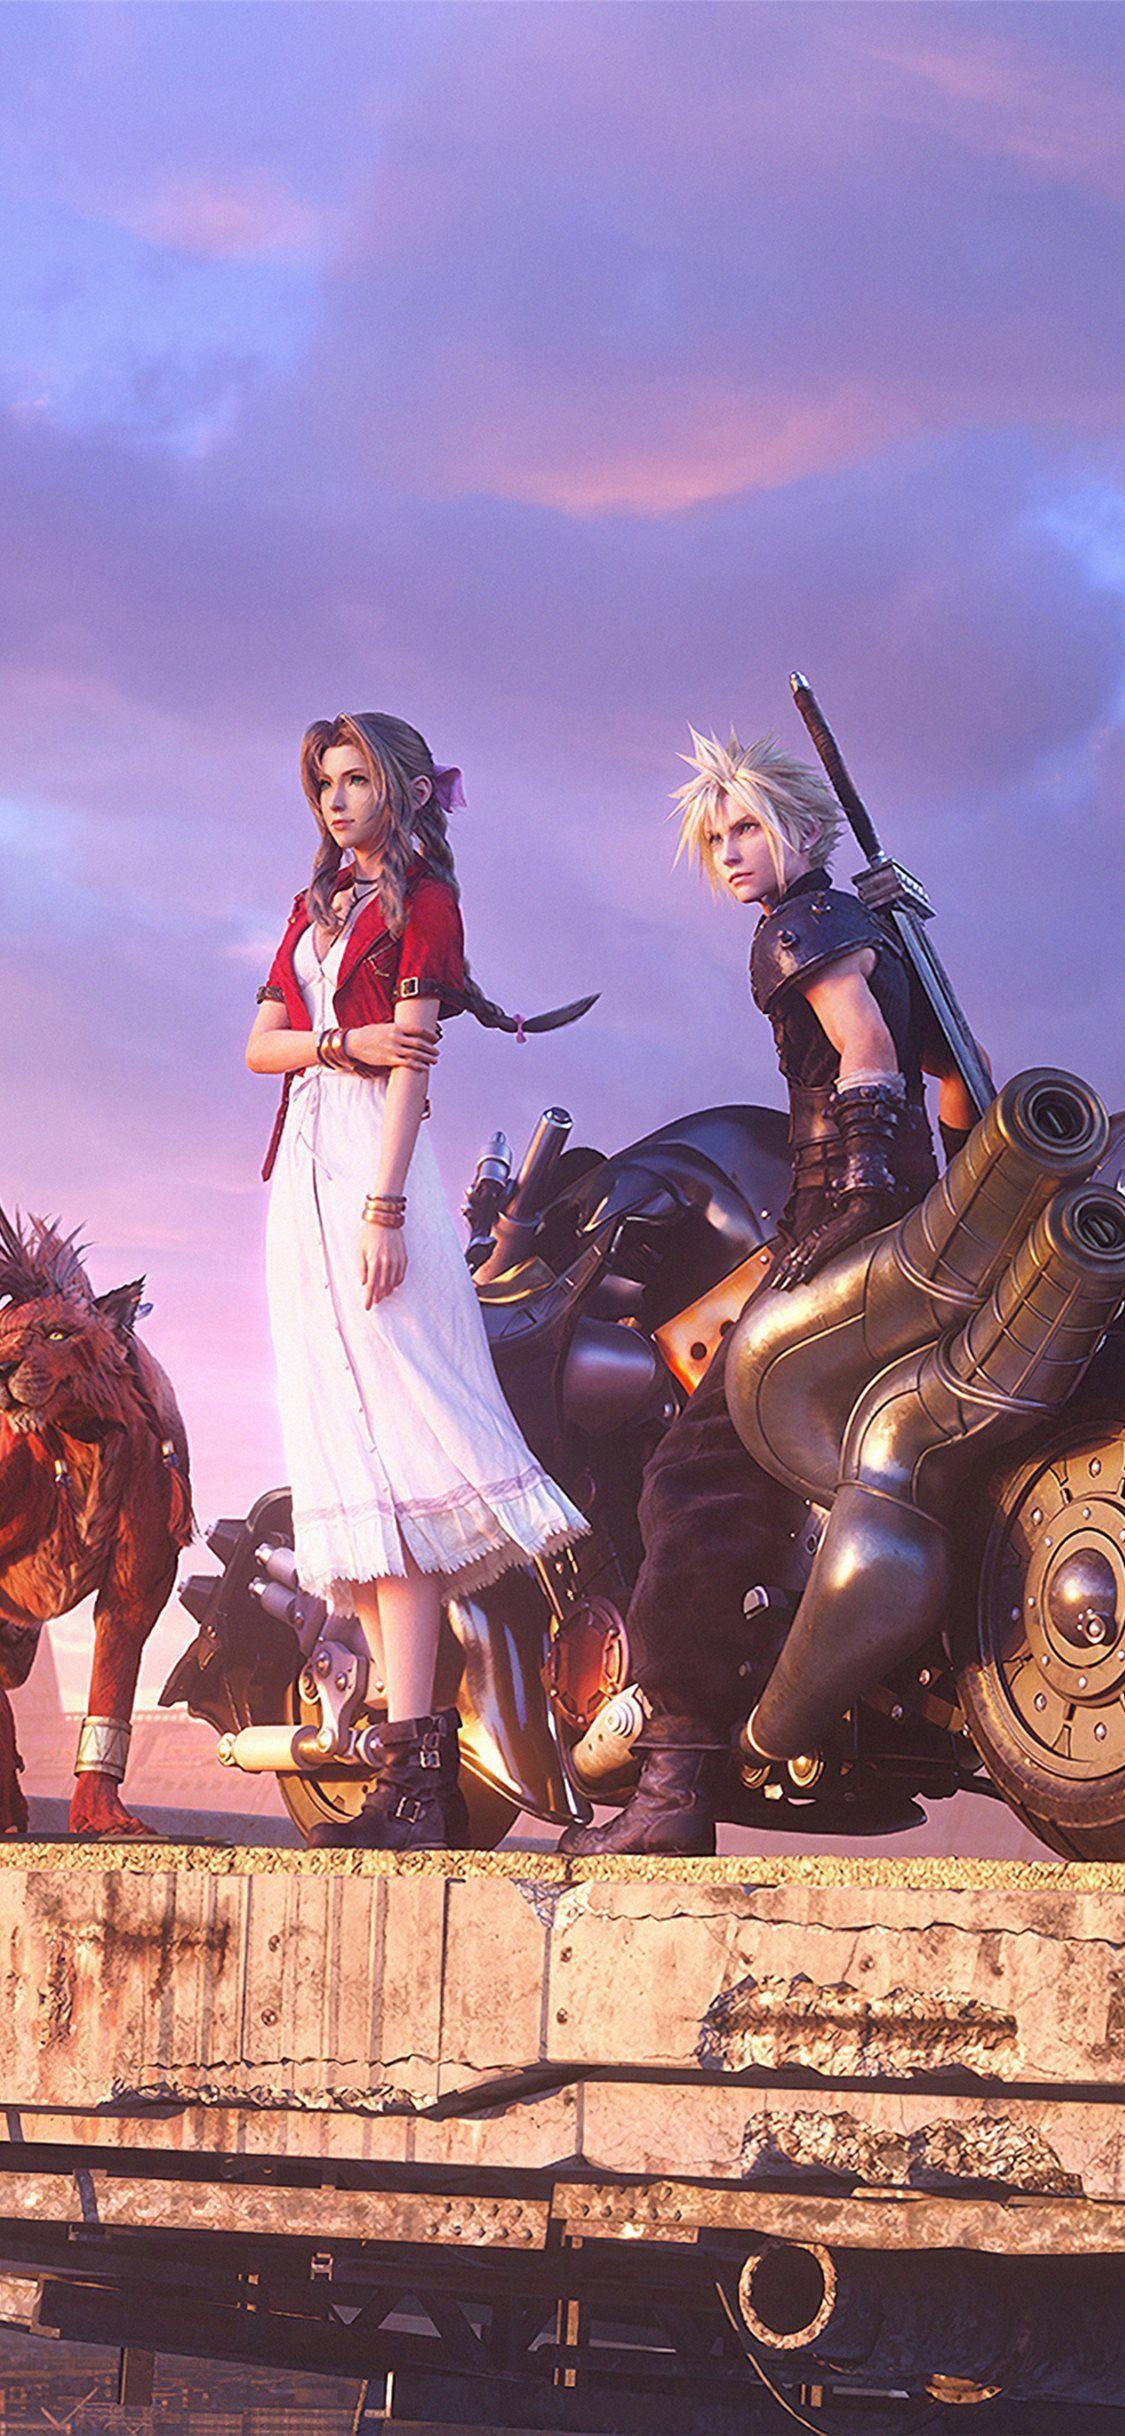 Final Fantasy Vii 5k Finalfantasy Games 4k 5k 2020games Iphonexwallpaper In 2020 Final Fantasy Final Fantasy Vii Wallpaper Iphone Love